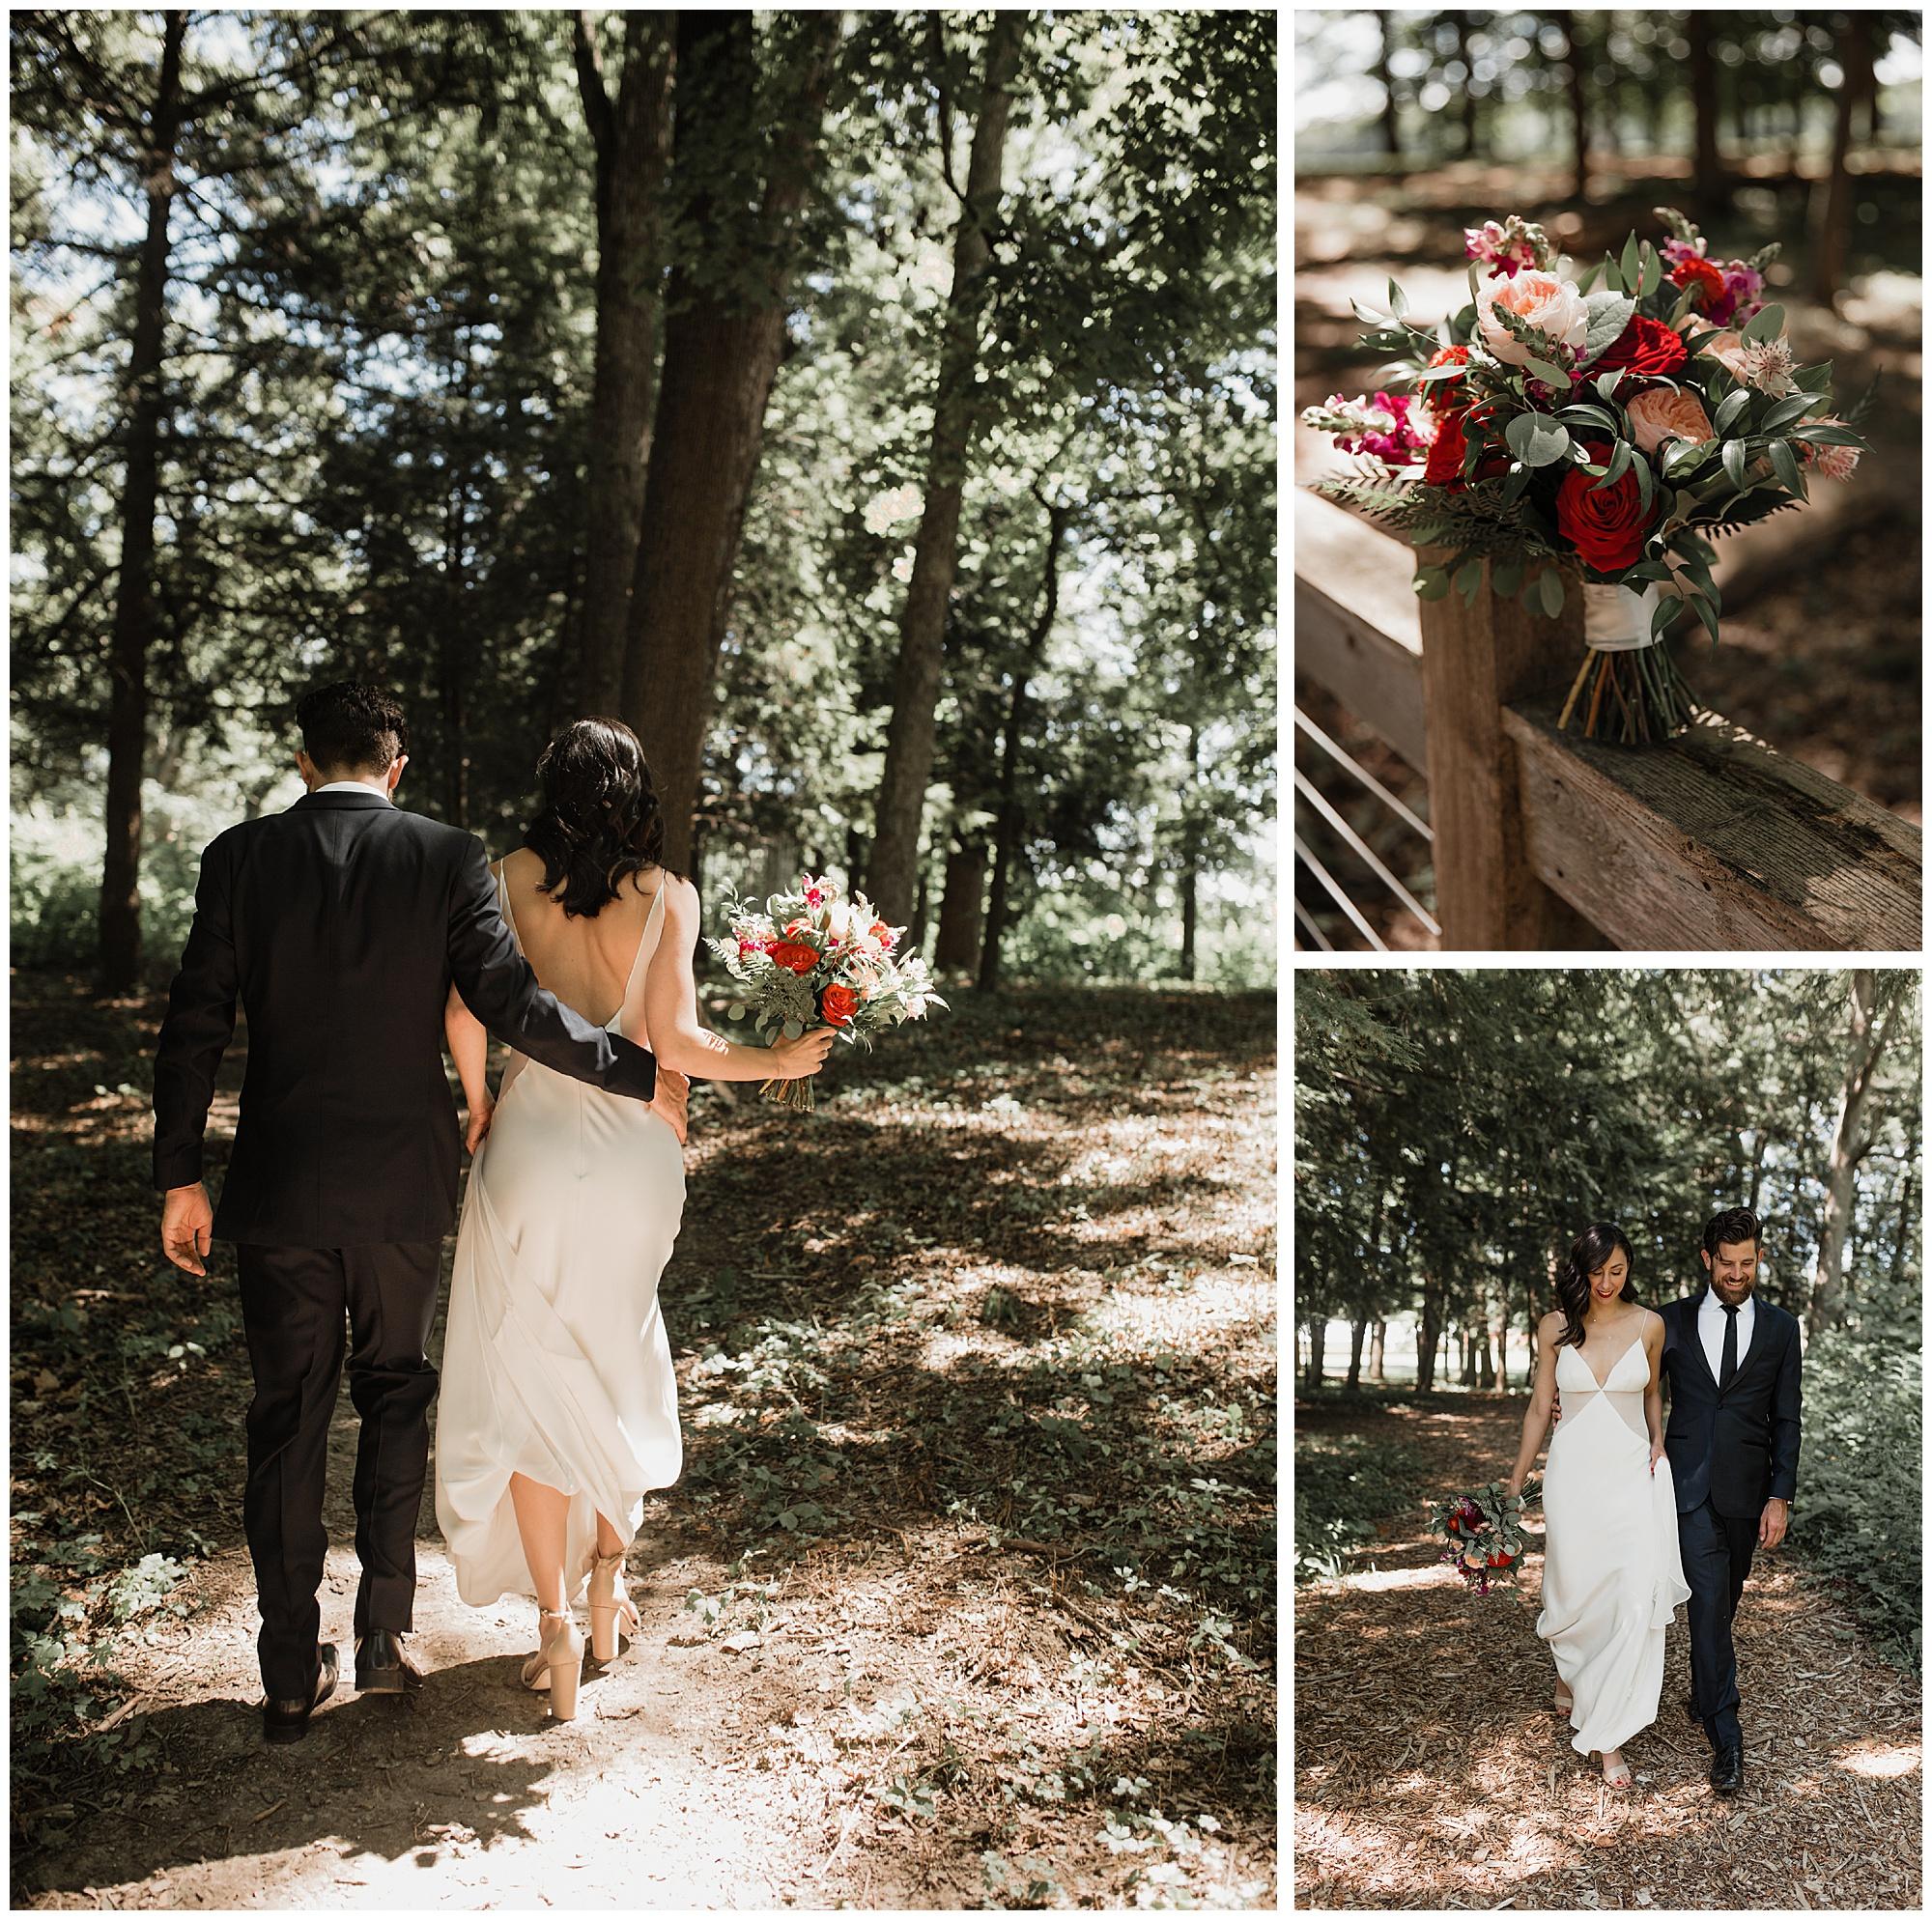 allerton_park_wedding_champaign_il_chicago_wright_photographs_ne_0011.jpg